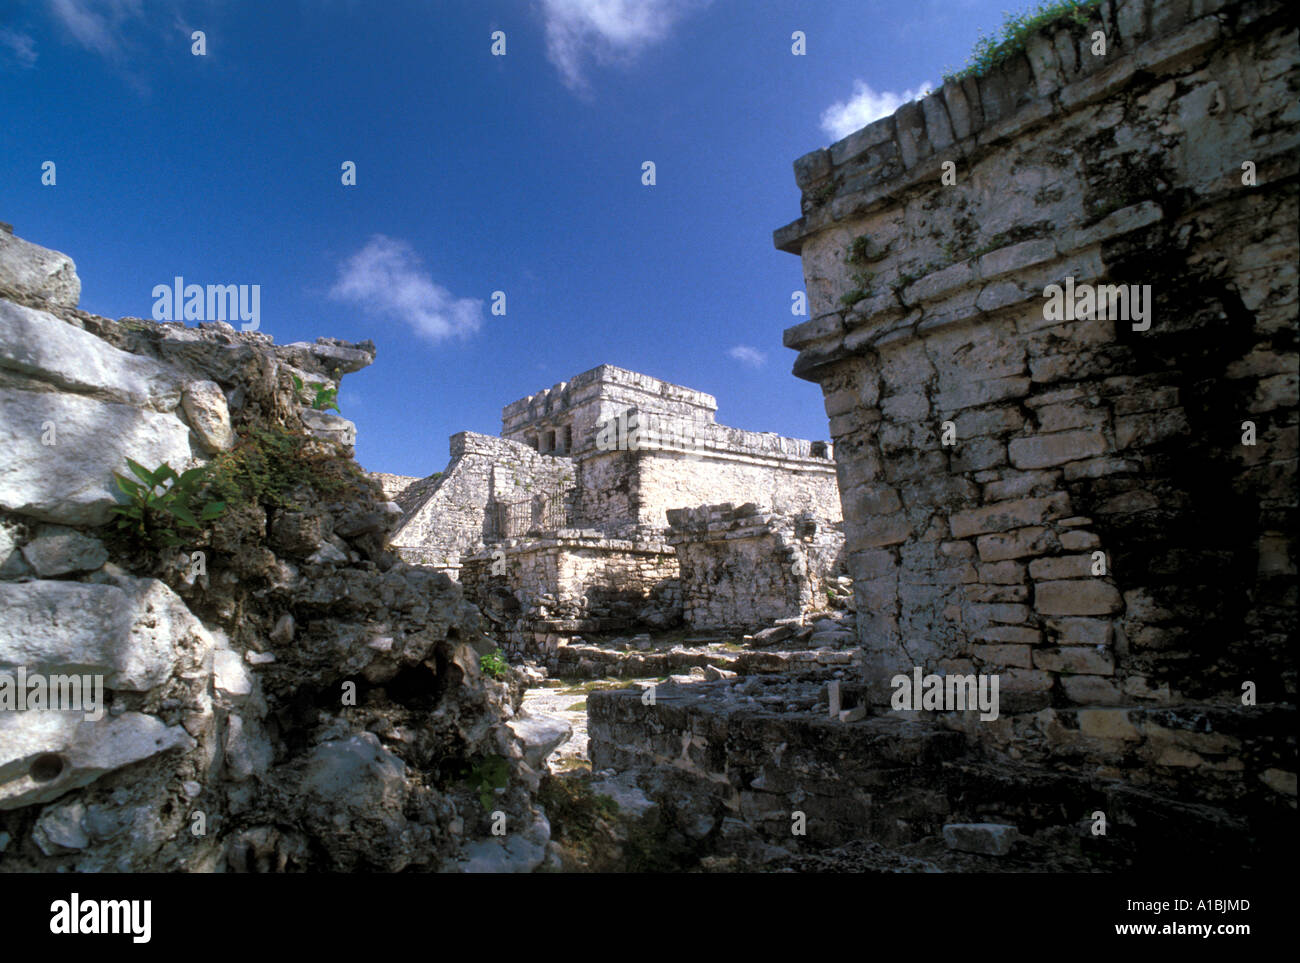 Tulum Maya Ruins pyramid - Stock Image